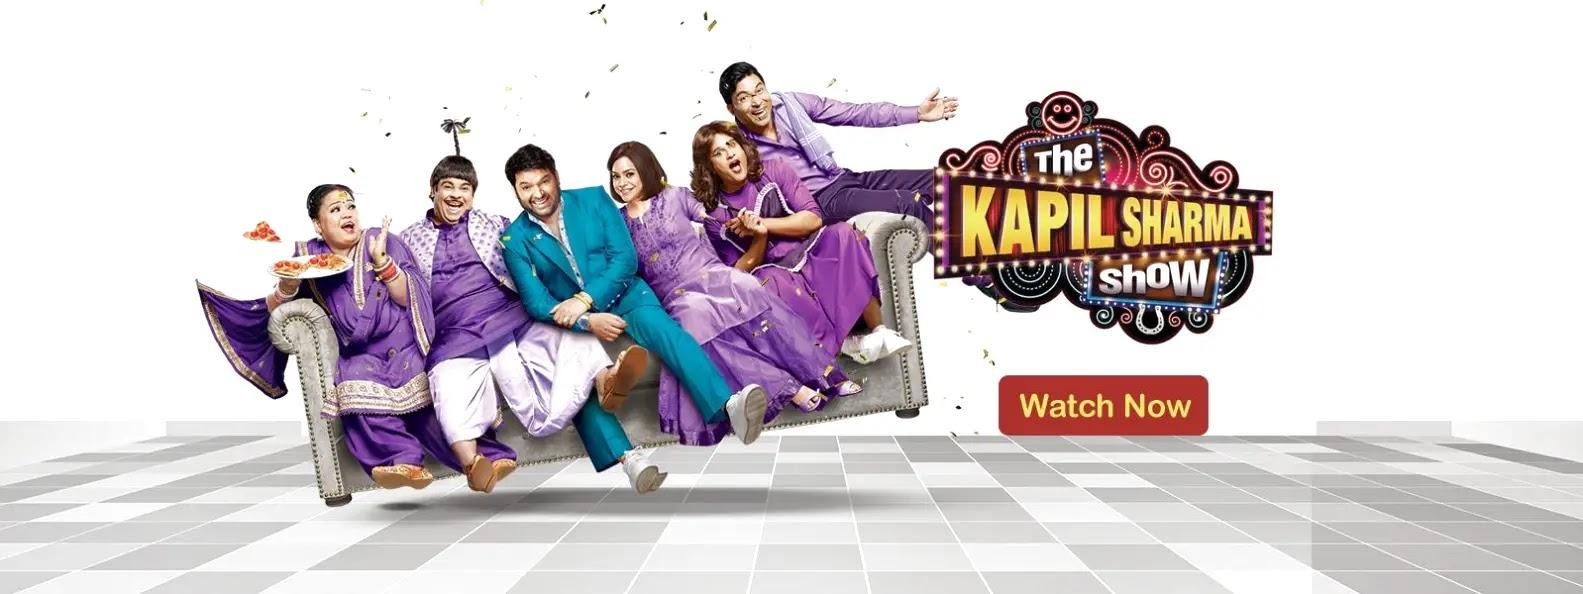 the kapil sharma show episodes free download